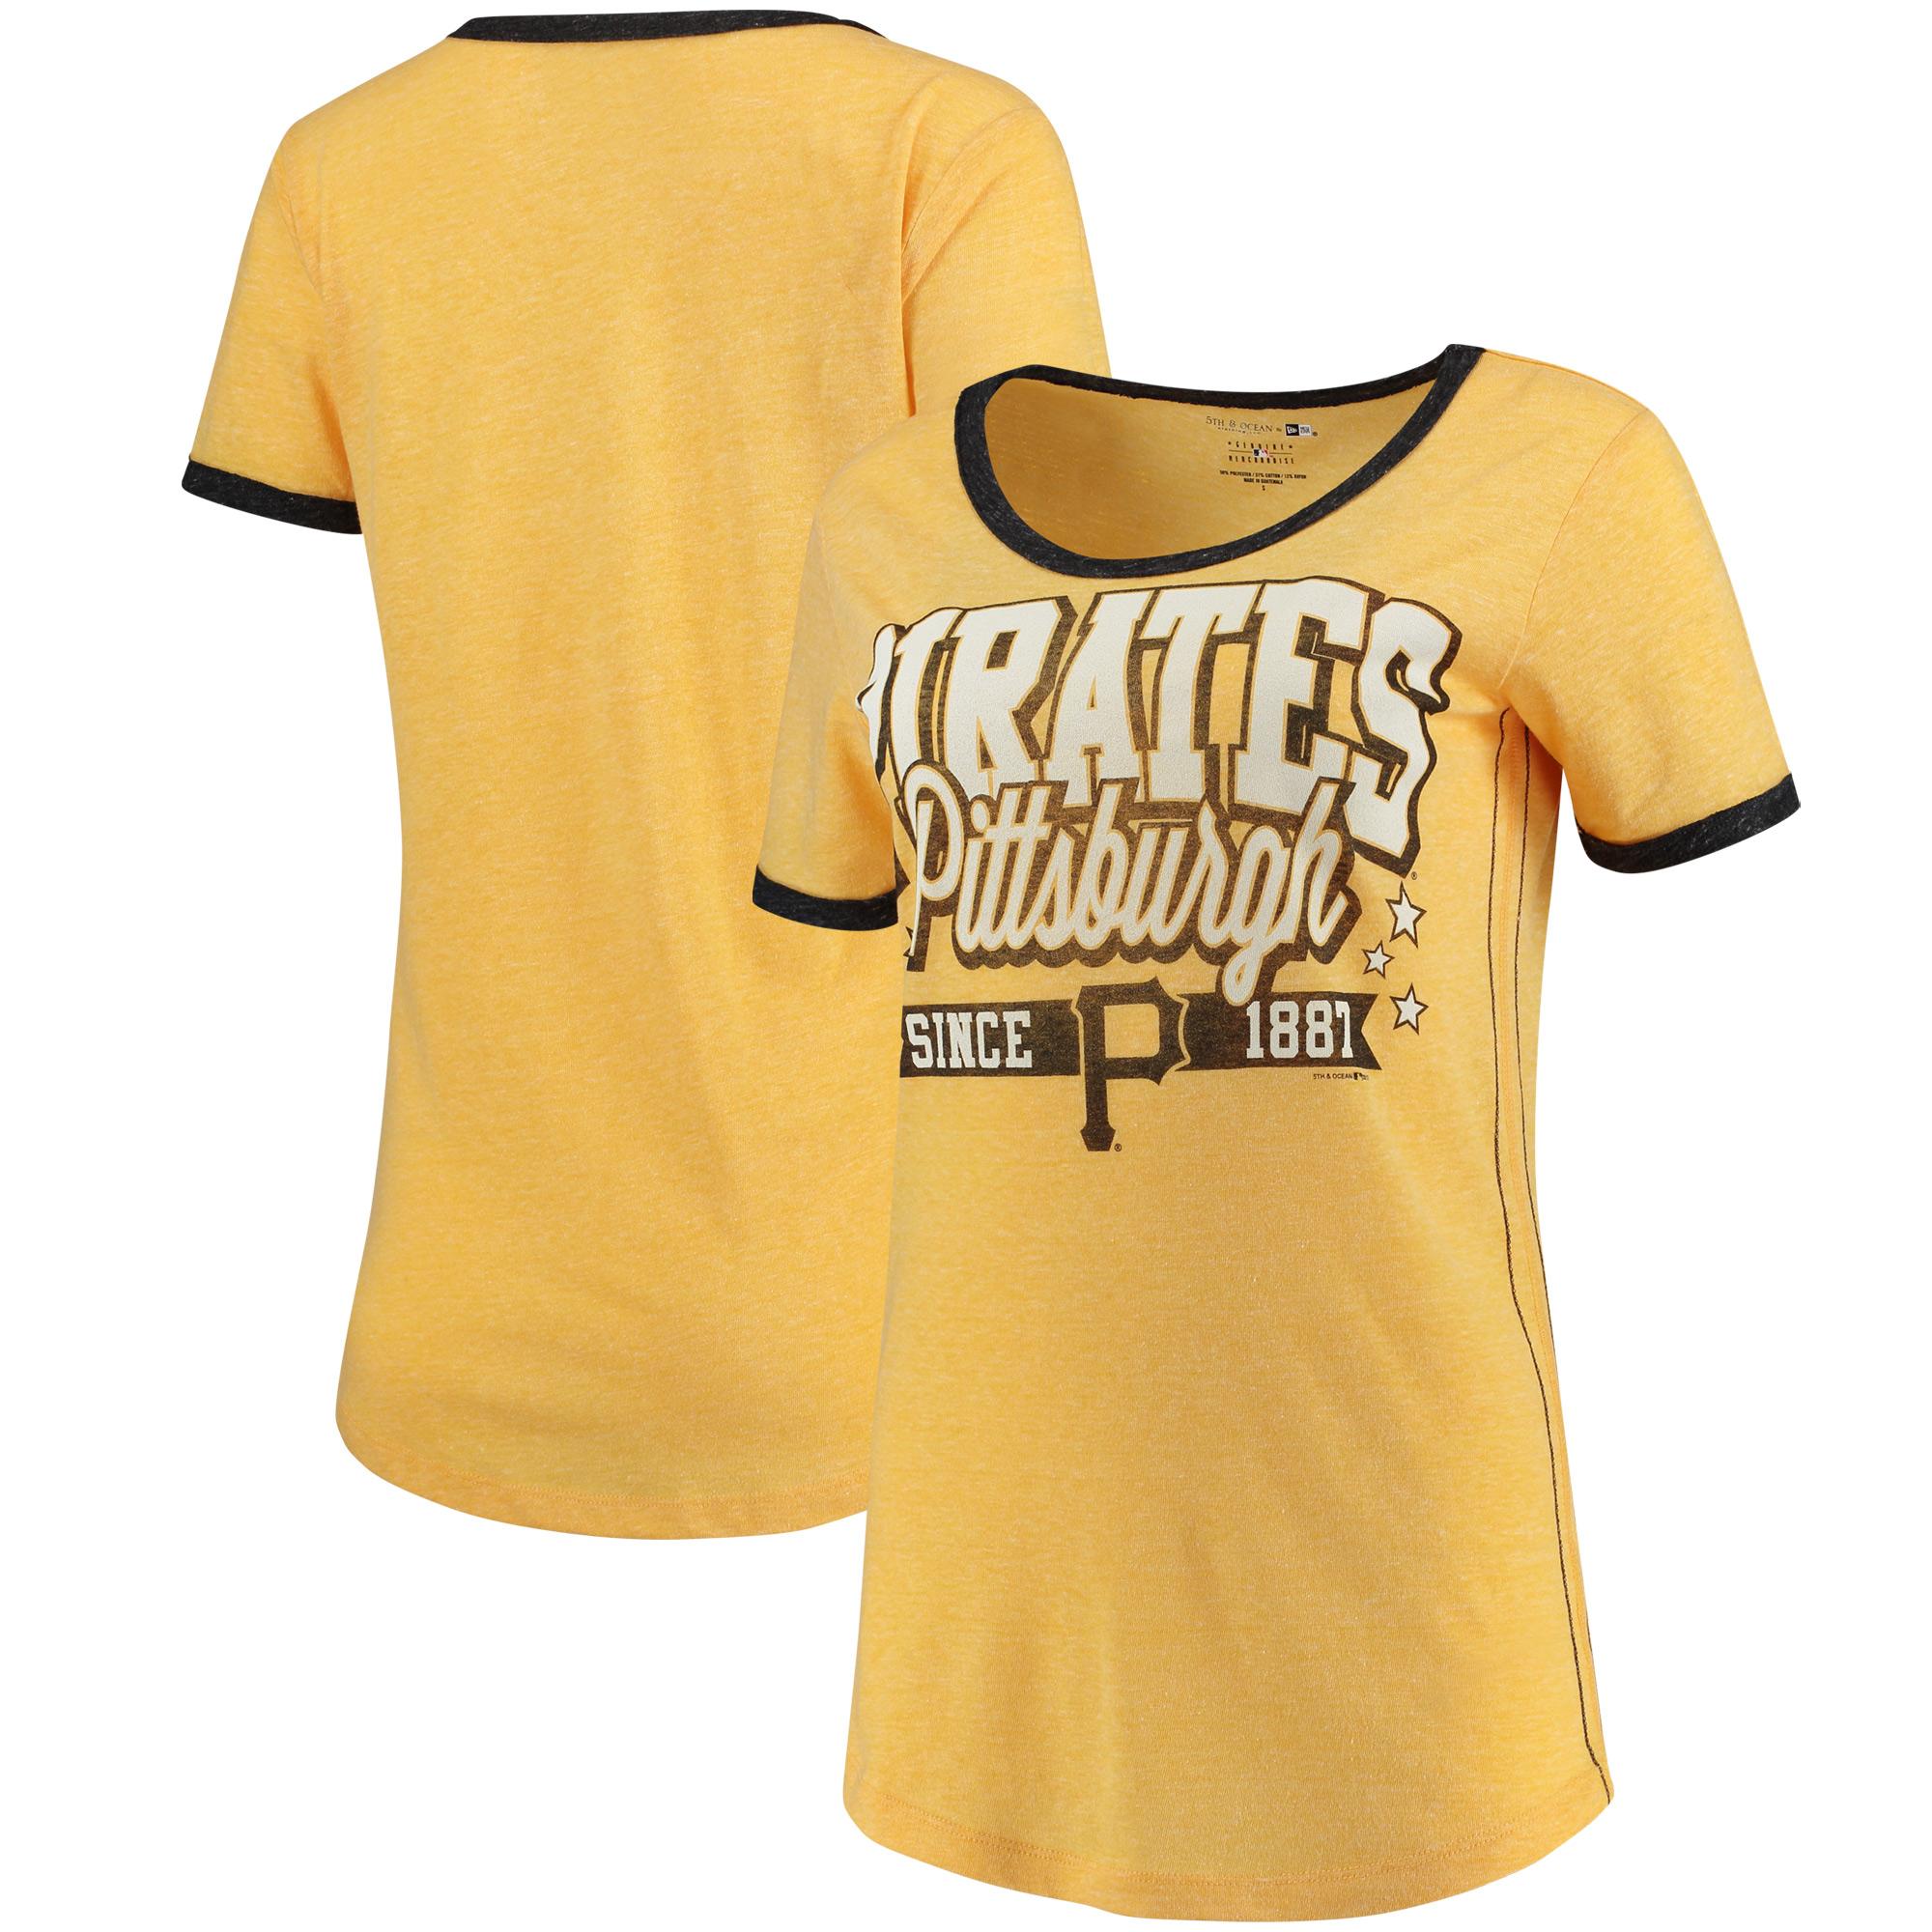 Pittsburgh Pirates 5th & Ocean by New Era Women's Jersey Ringer Tri-Blend T-Shirt - Gold/Black